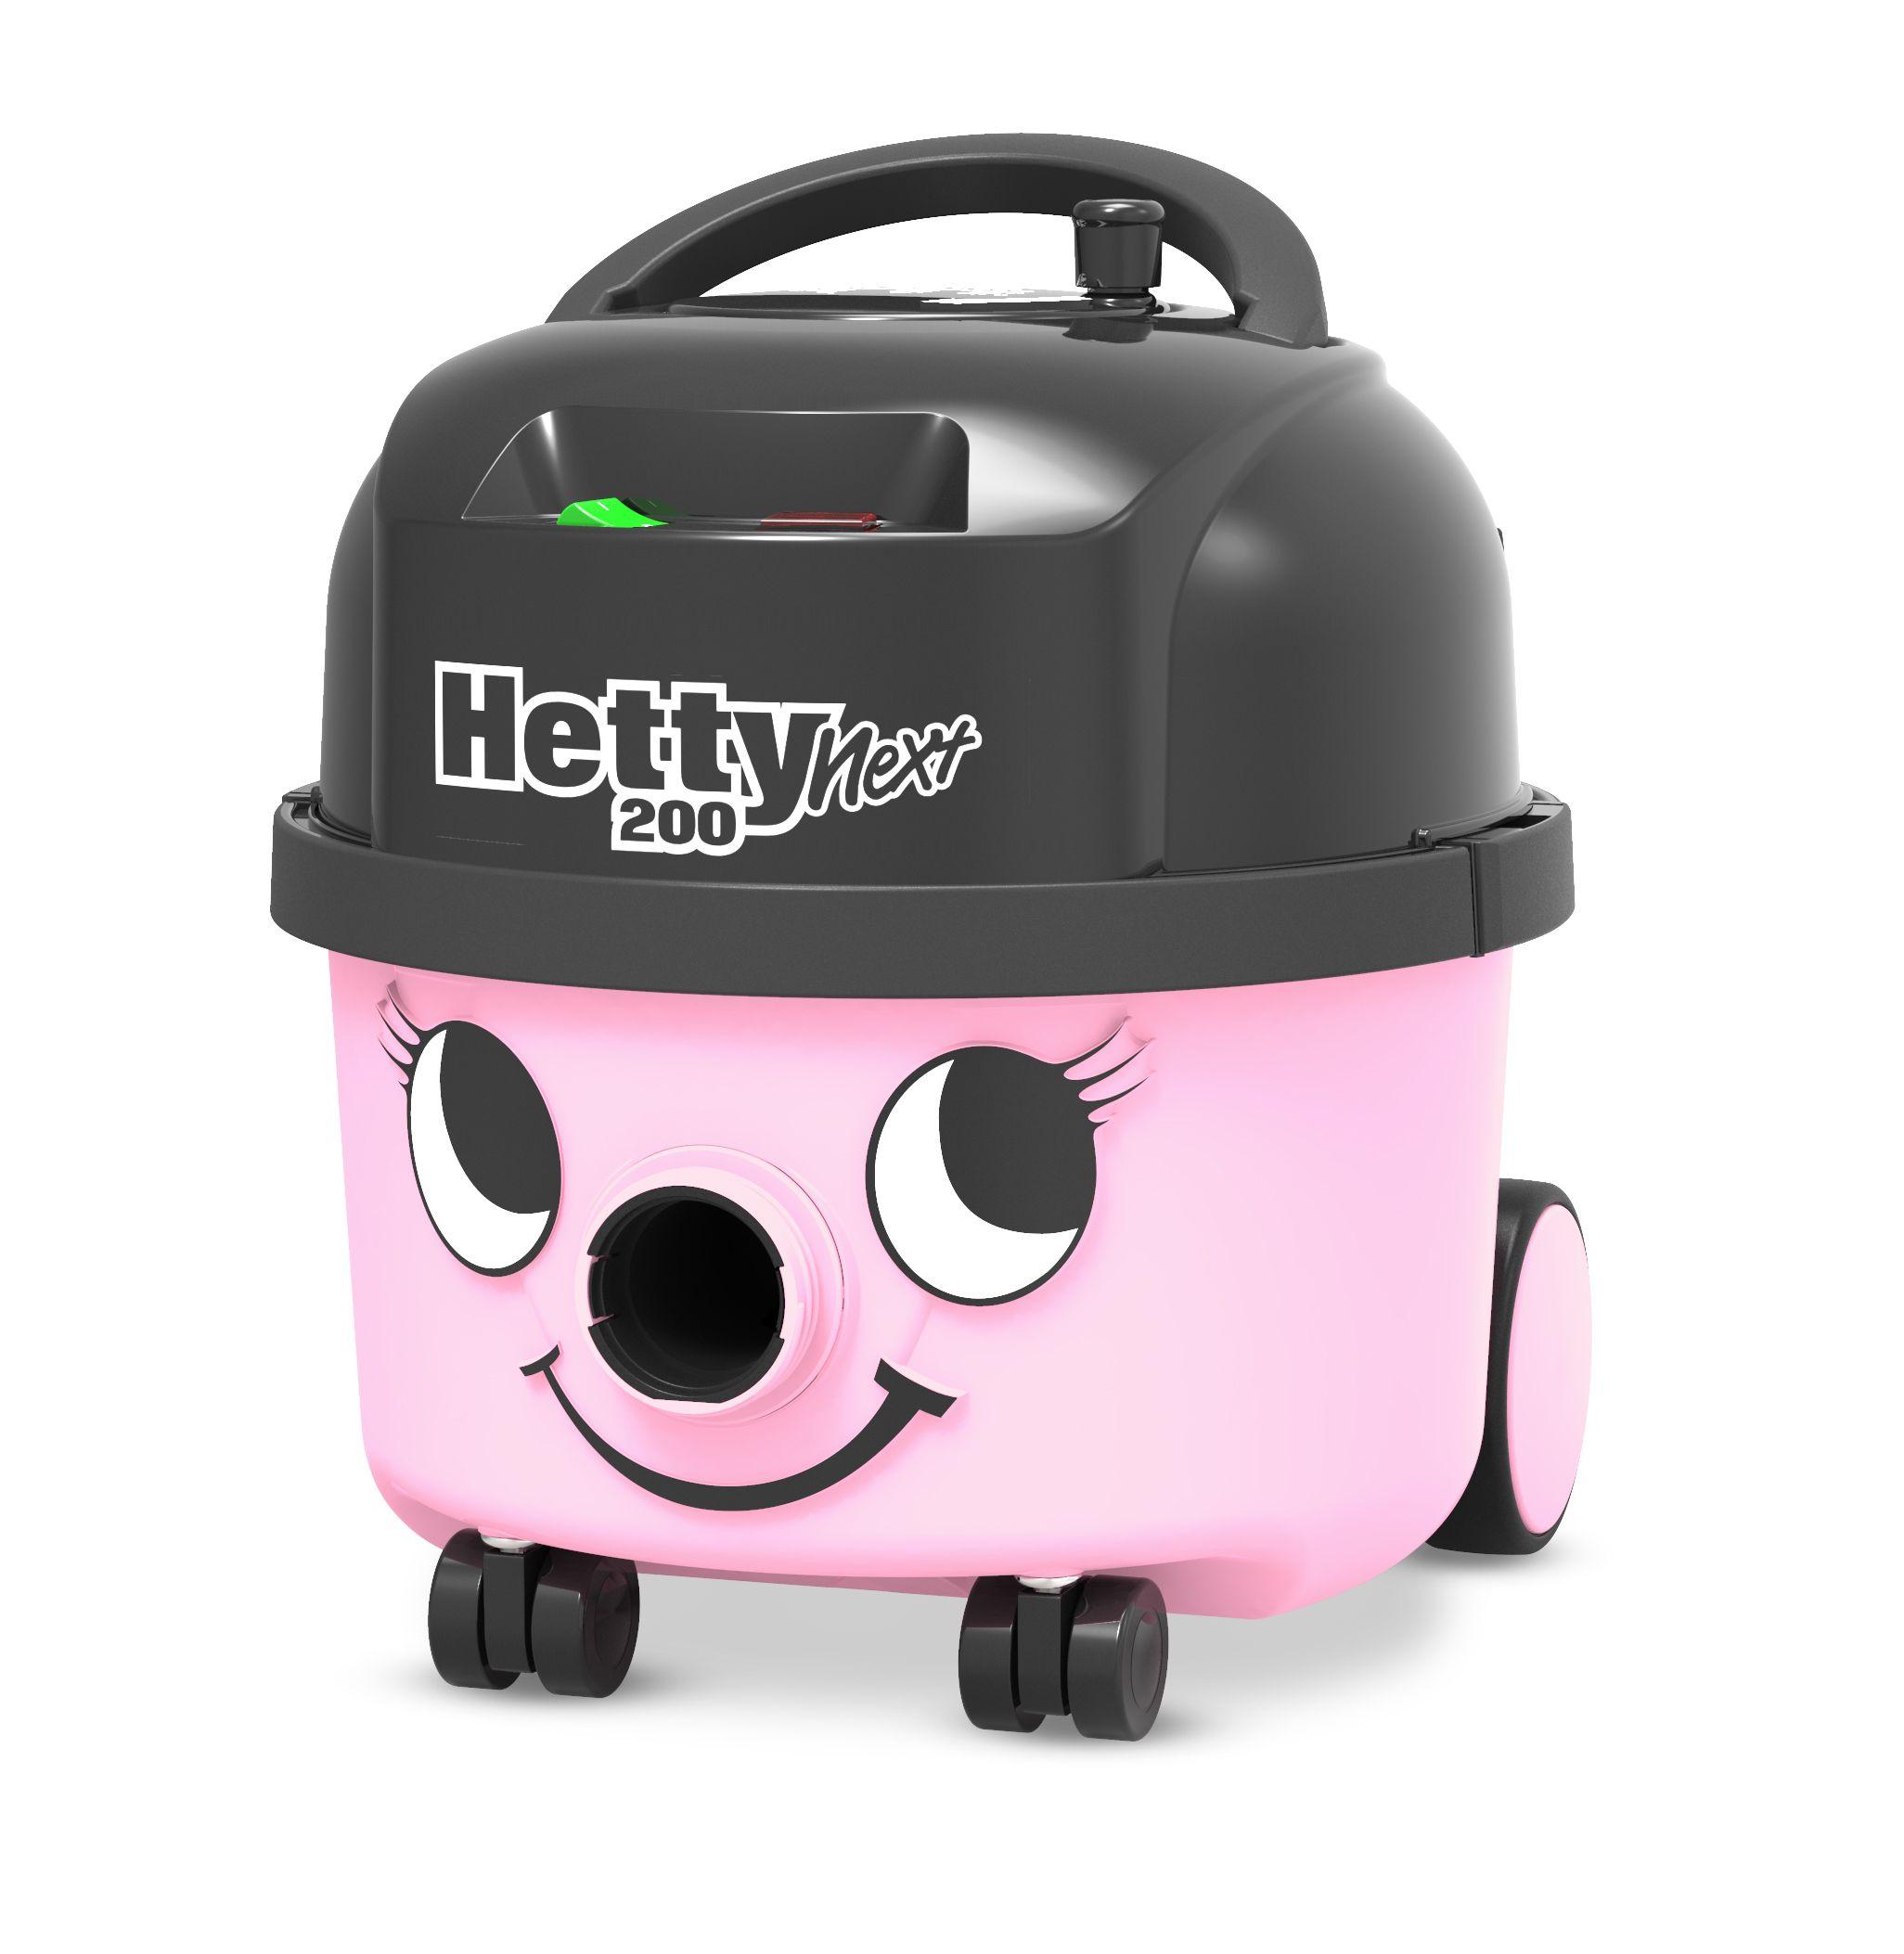 Stofzuiger Hetty Next HVN208-11 roze met kit AST1